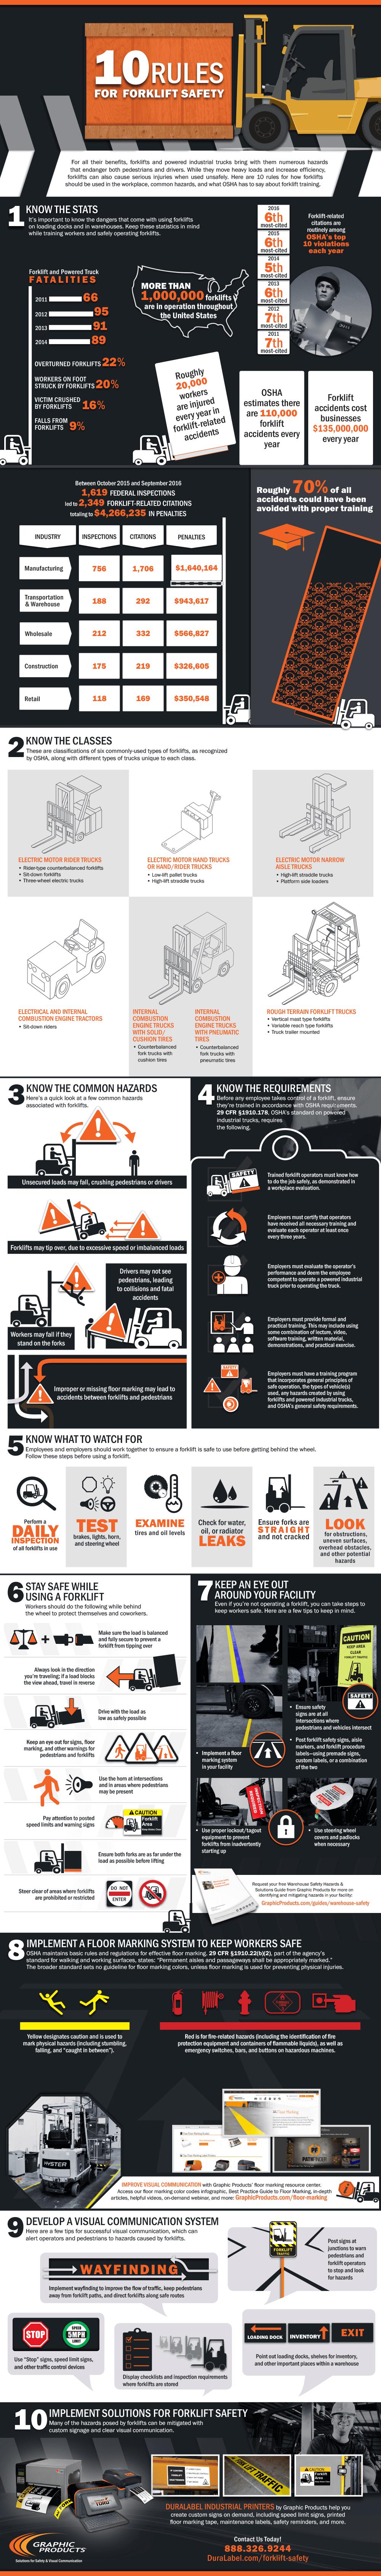 10 Rules for Forklift Safety